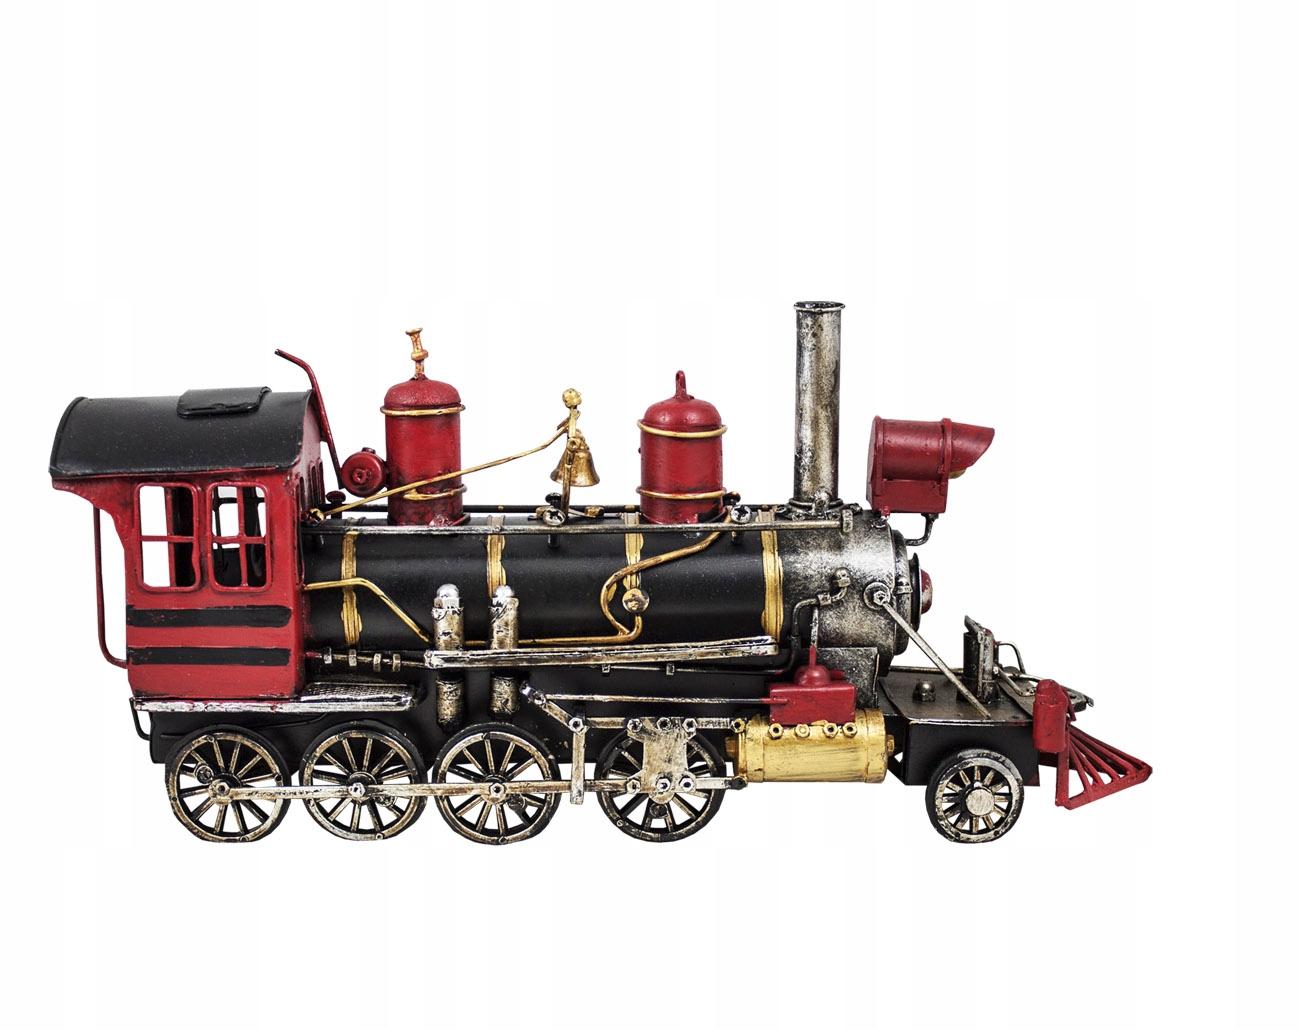 Replika modelu retro vlaku LOKOMOTÍV MSzhh09